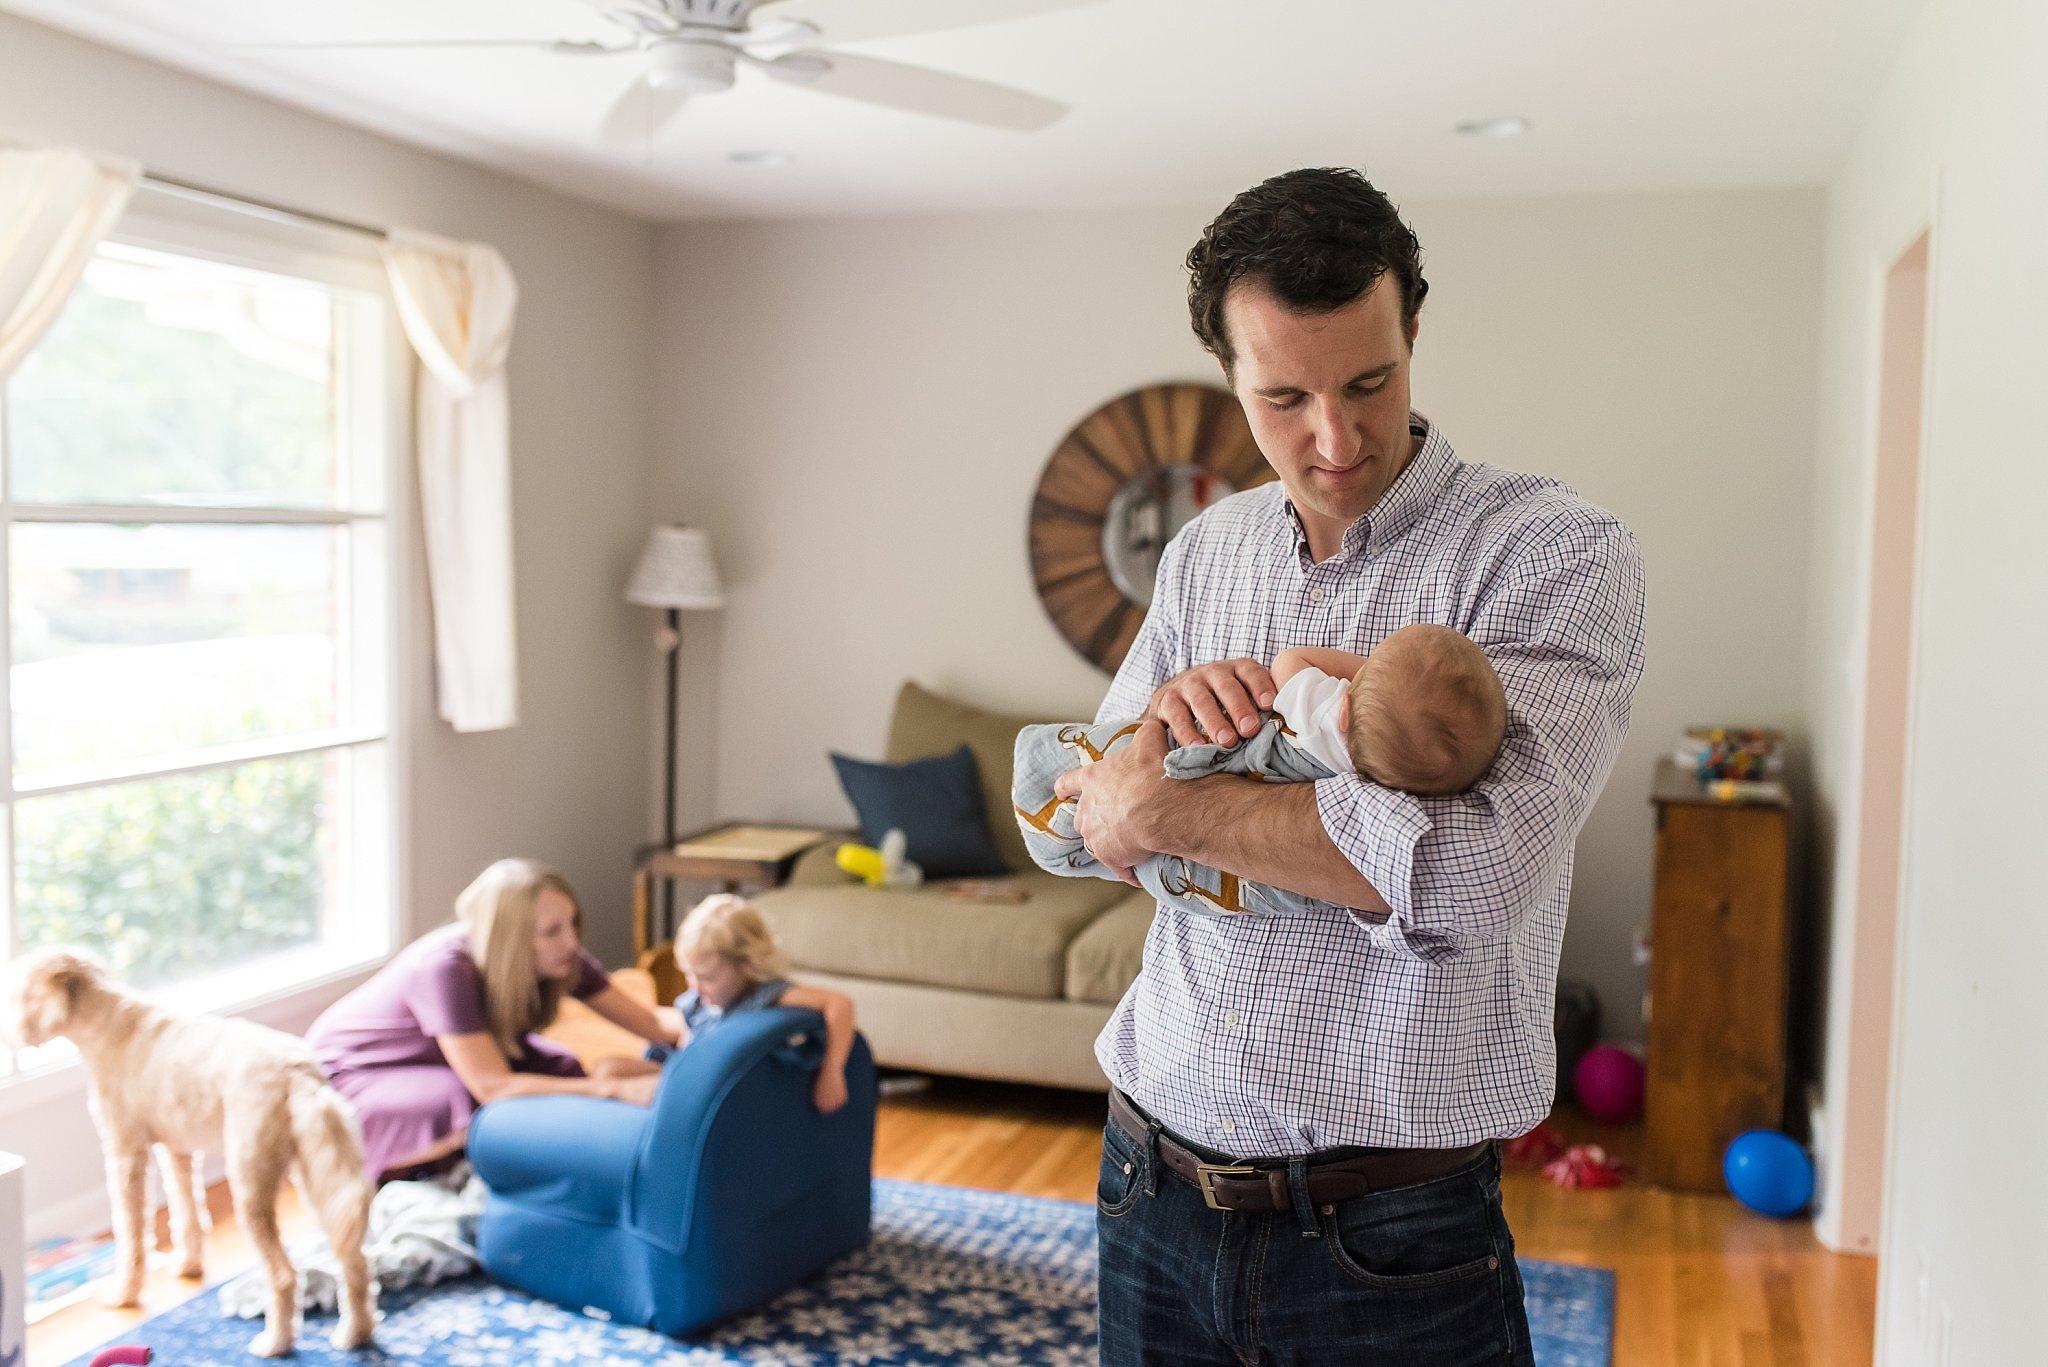 atlanta-family-photographers-decatur-newborn-photography (8).jpg